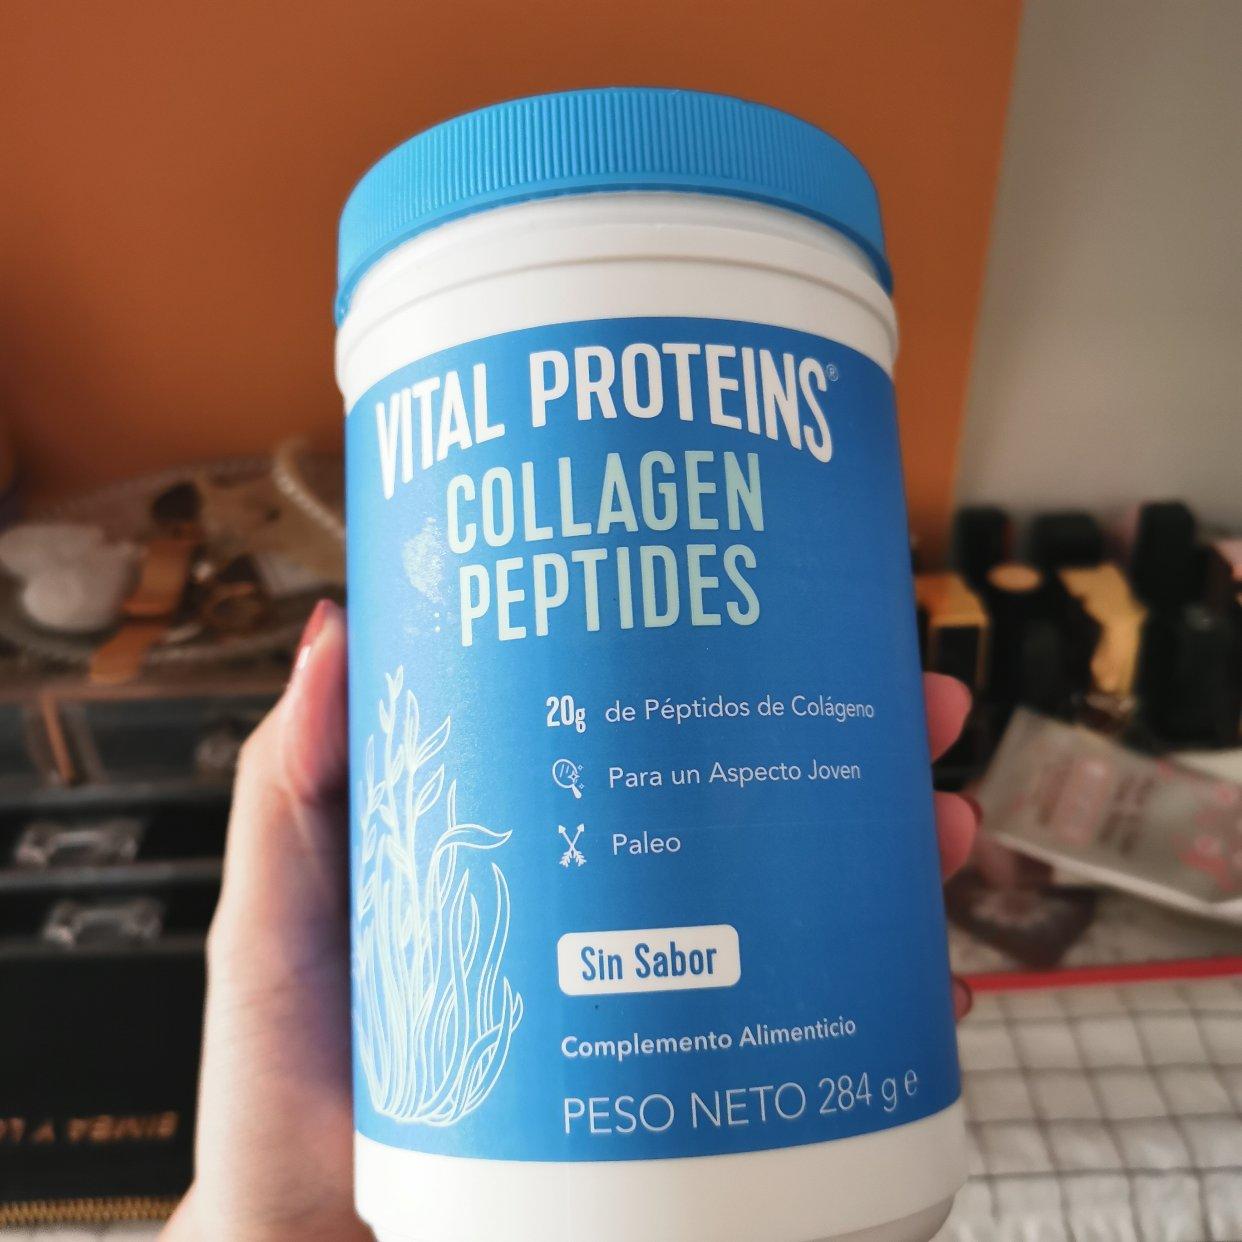 Vital Proteins护关节水光肌小蓝罐